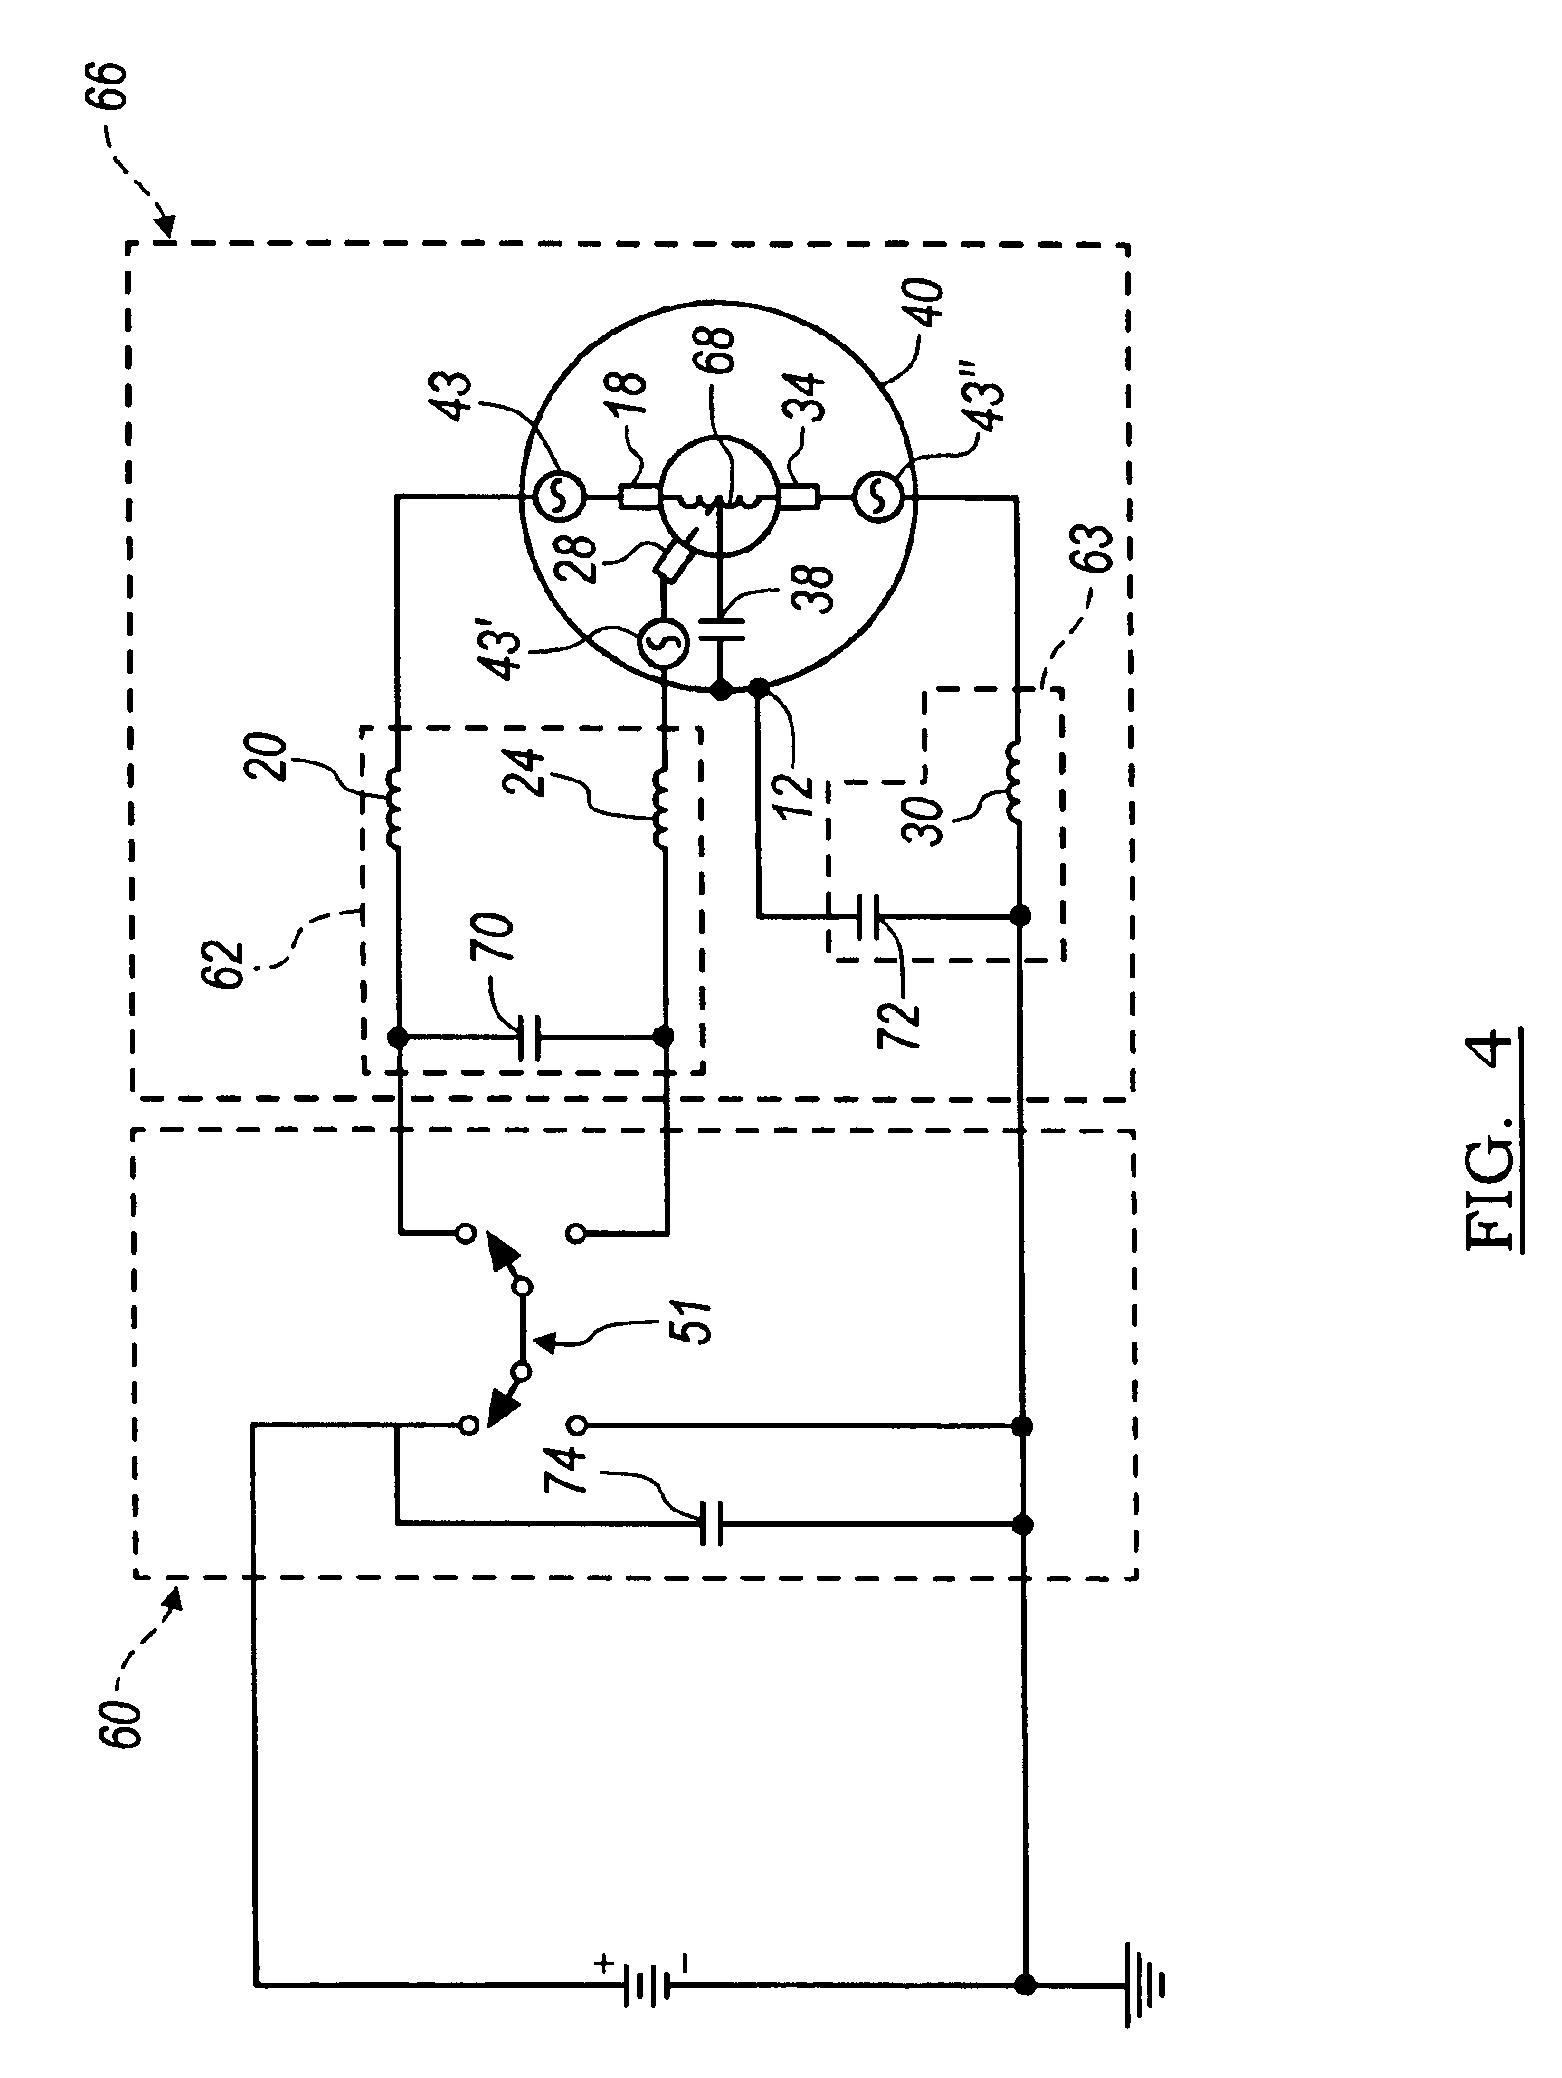 patent us6930457 dc motor brush filter circuit patents LED Circuit patent drawing